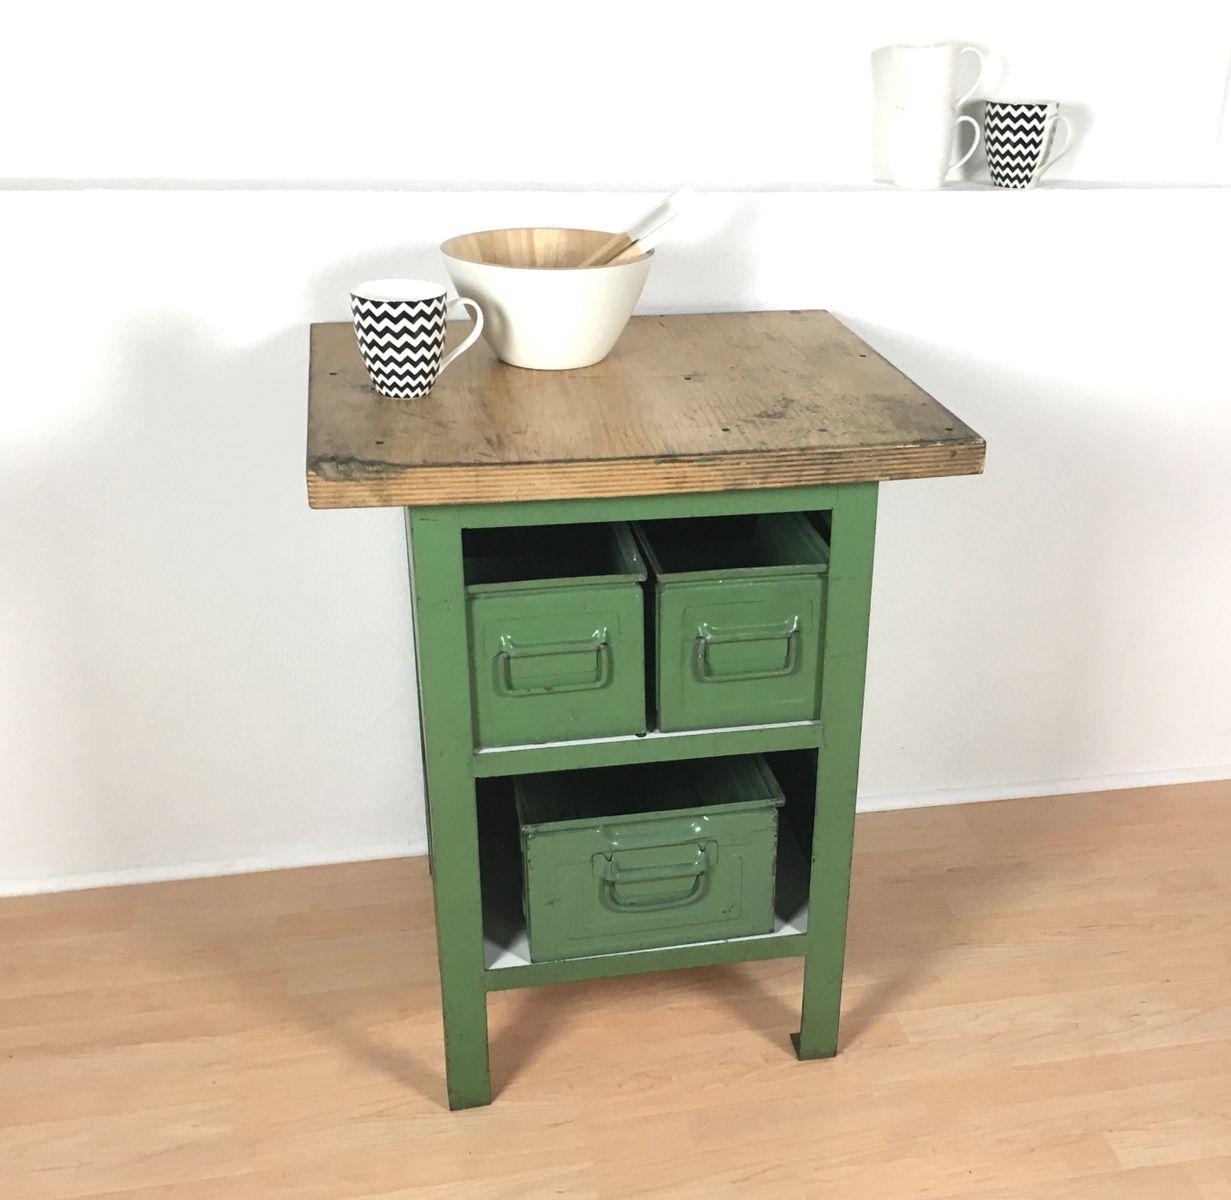 Kitchen Cabinet Manufacturers List Vintage Industrial Green Metal Cabinet 1970s For Sale At